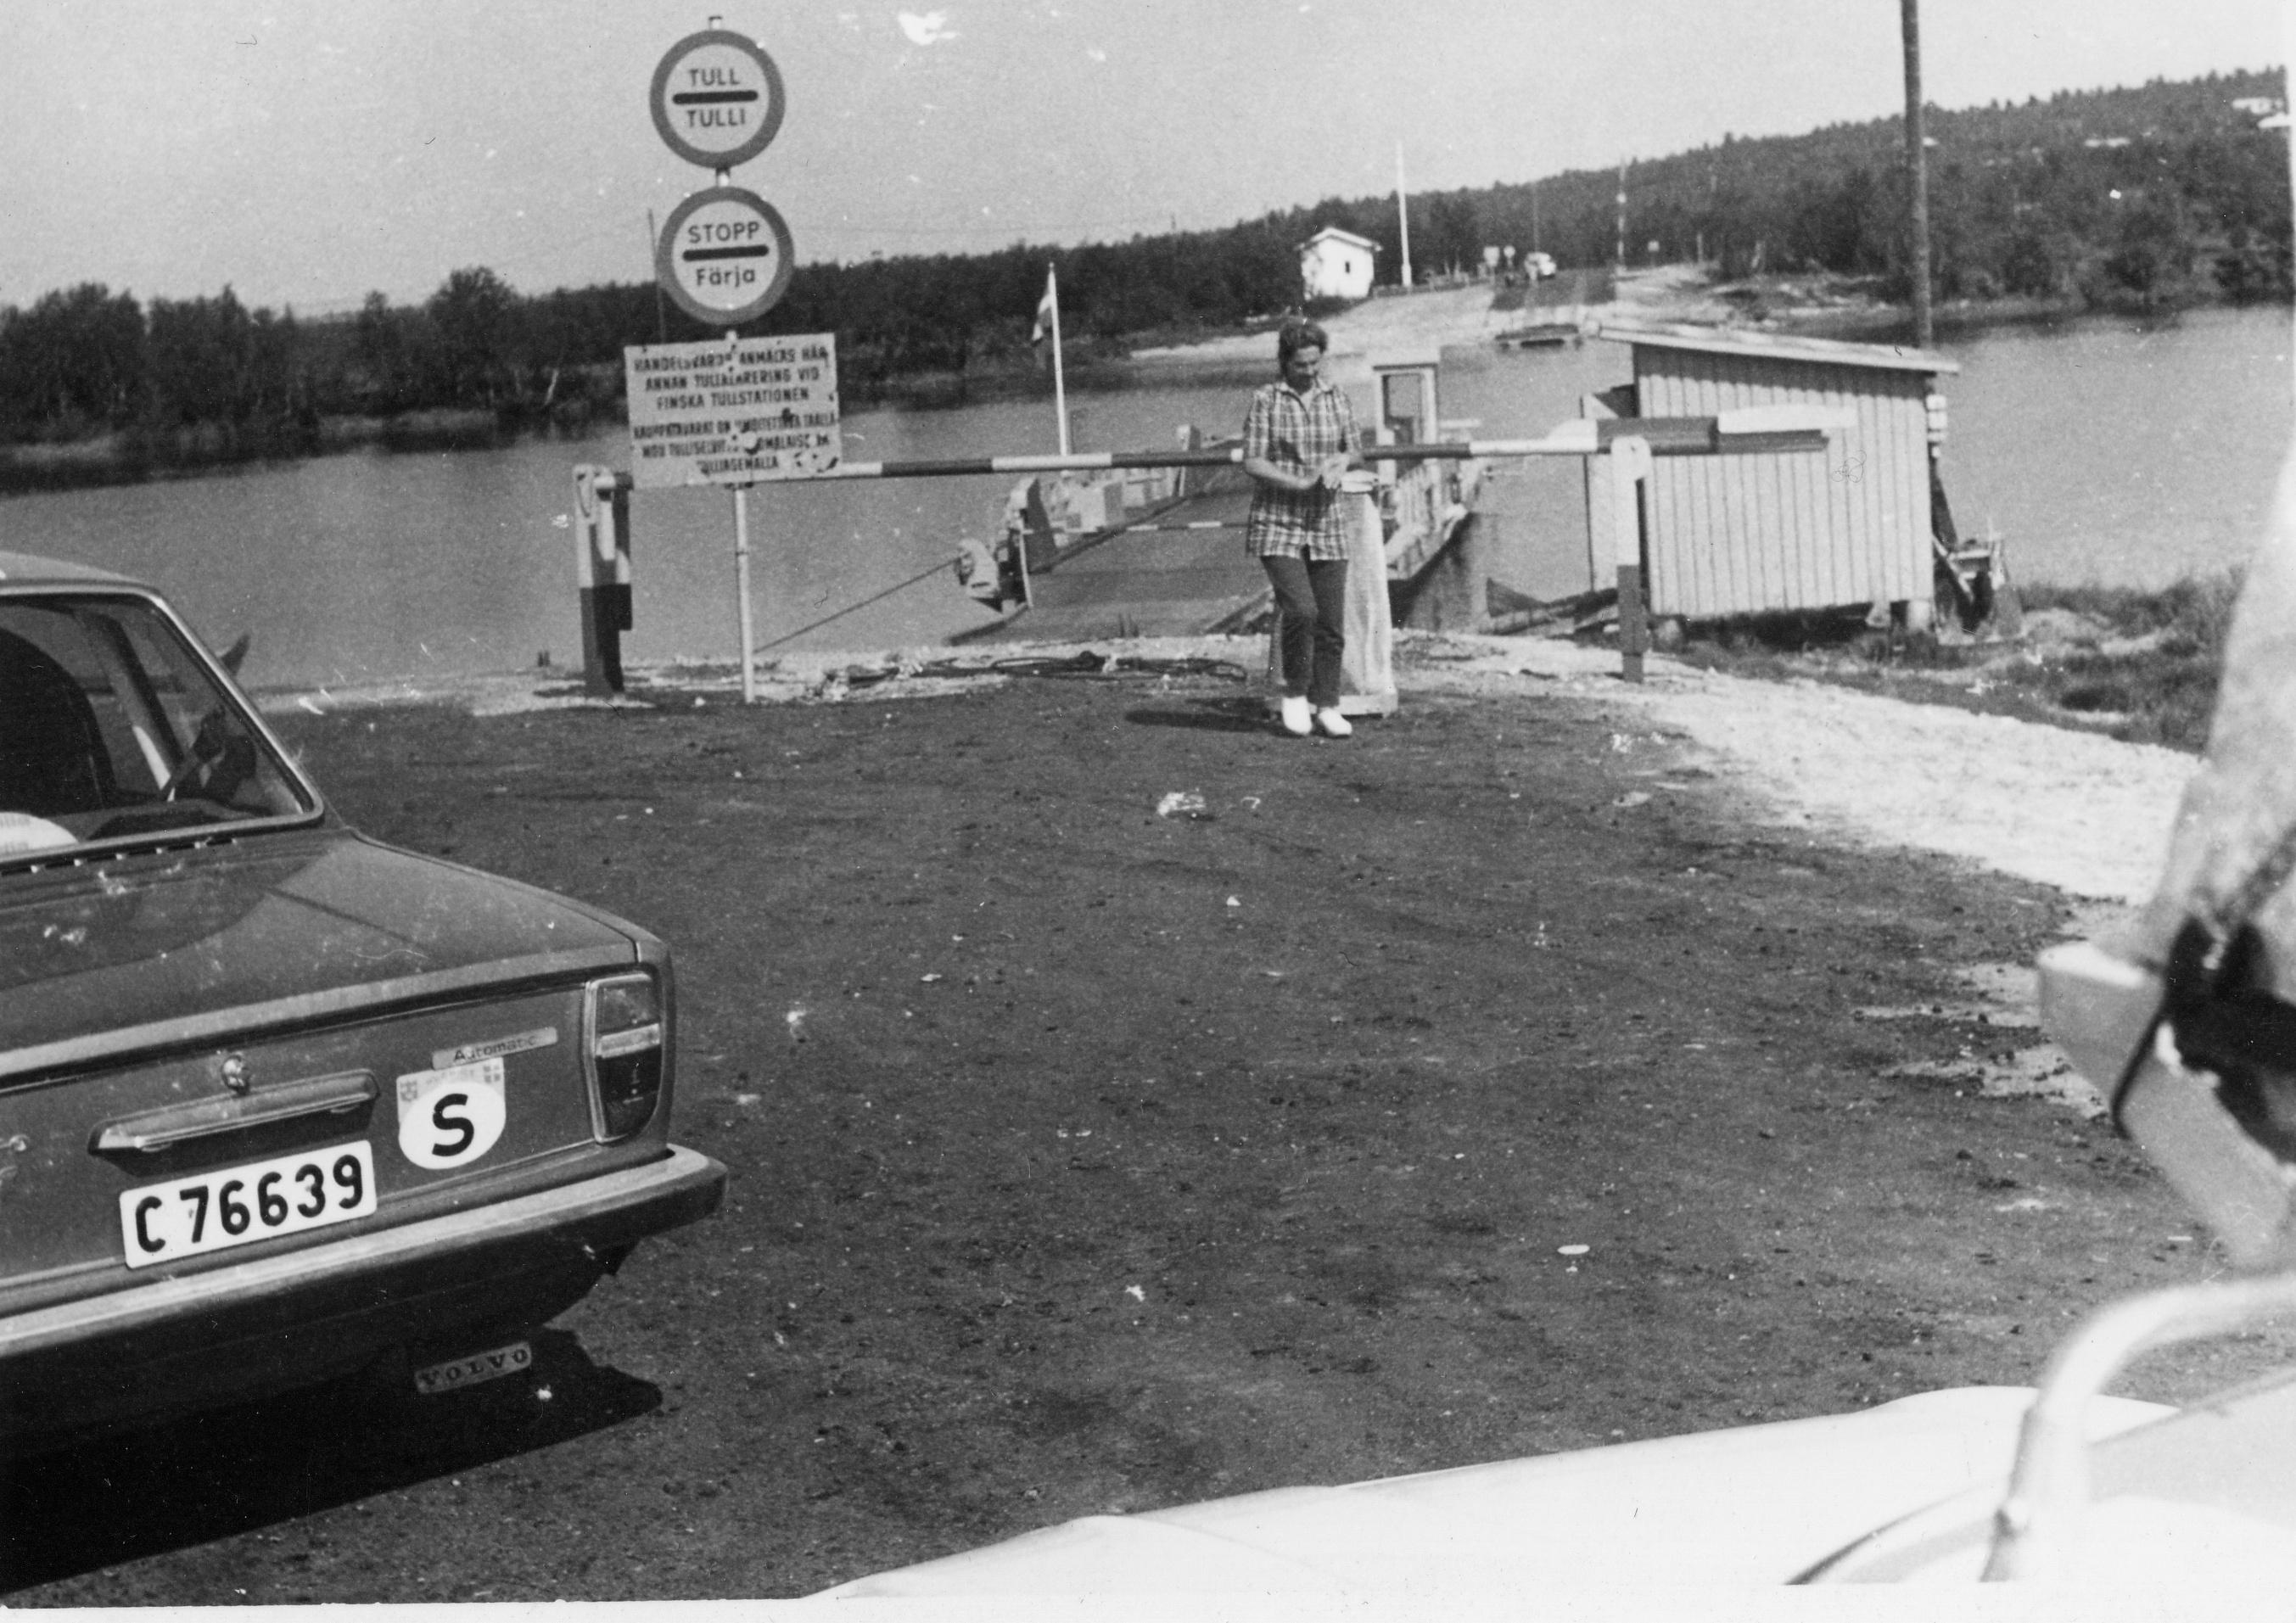 Ferry_in_karesuando_1972.jpg